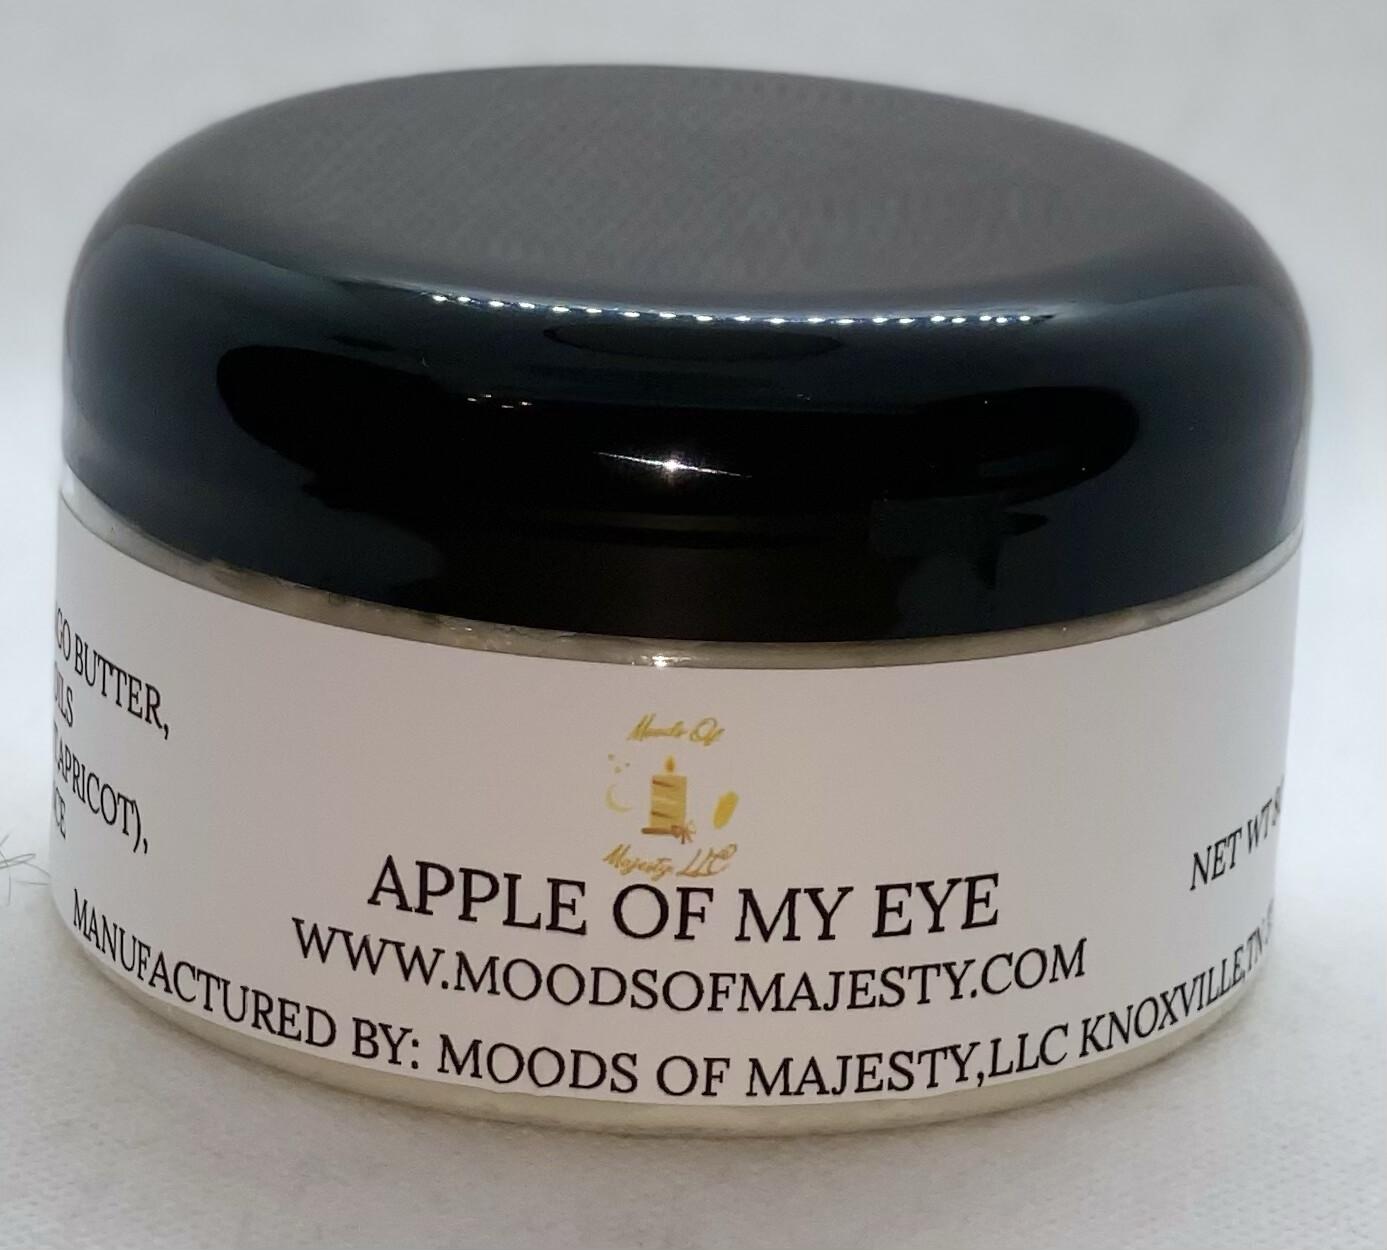 Apple Of My Eye Majesty Whip